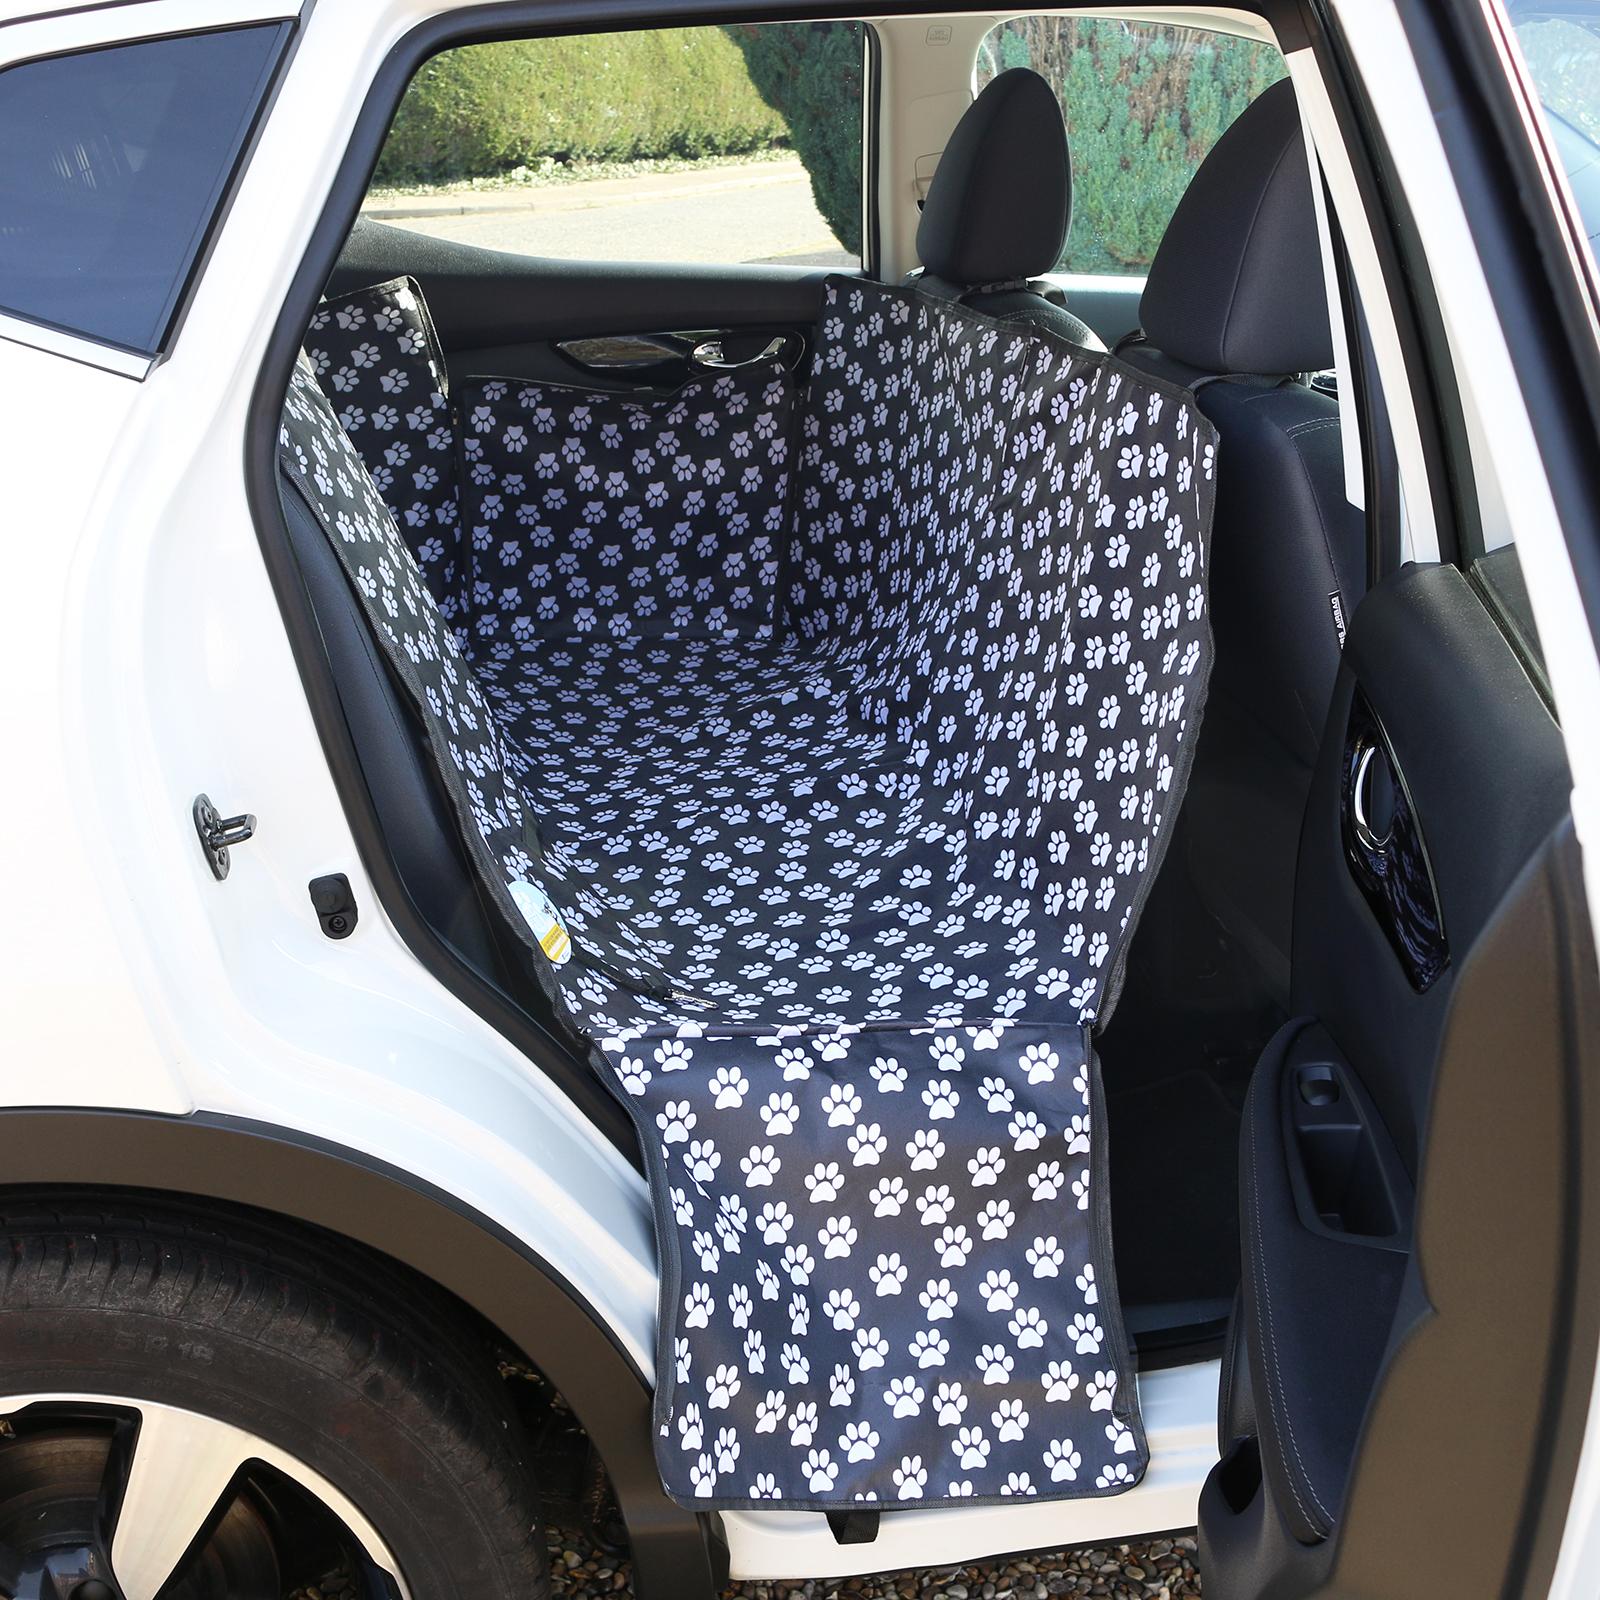 Paw Print Waterproof Car Seat Cover